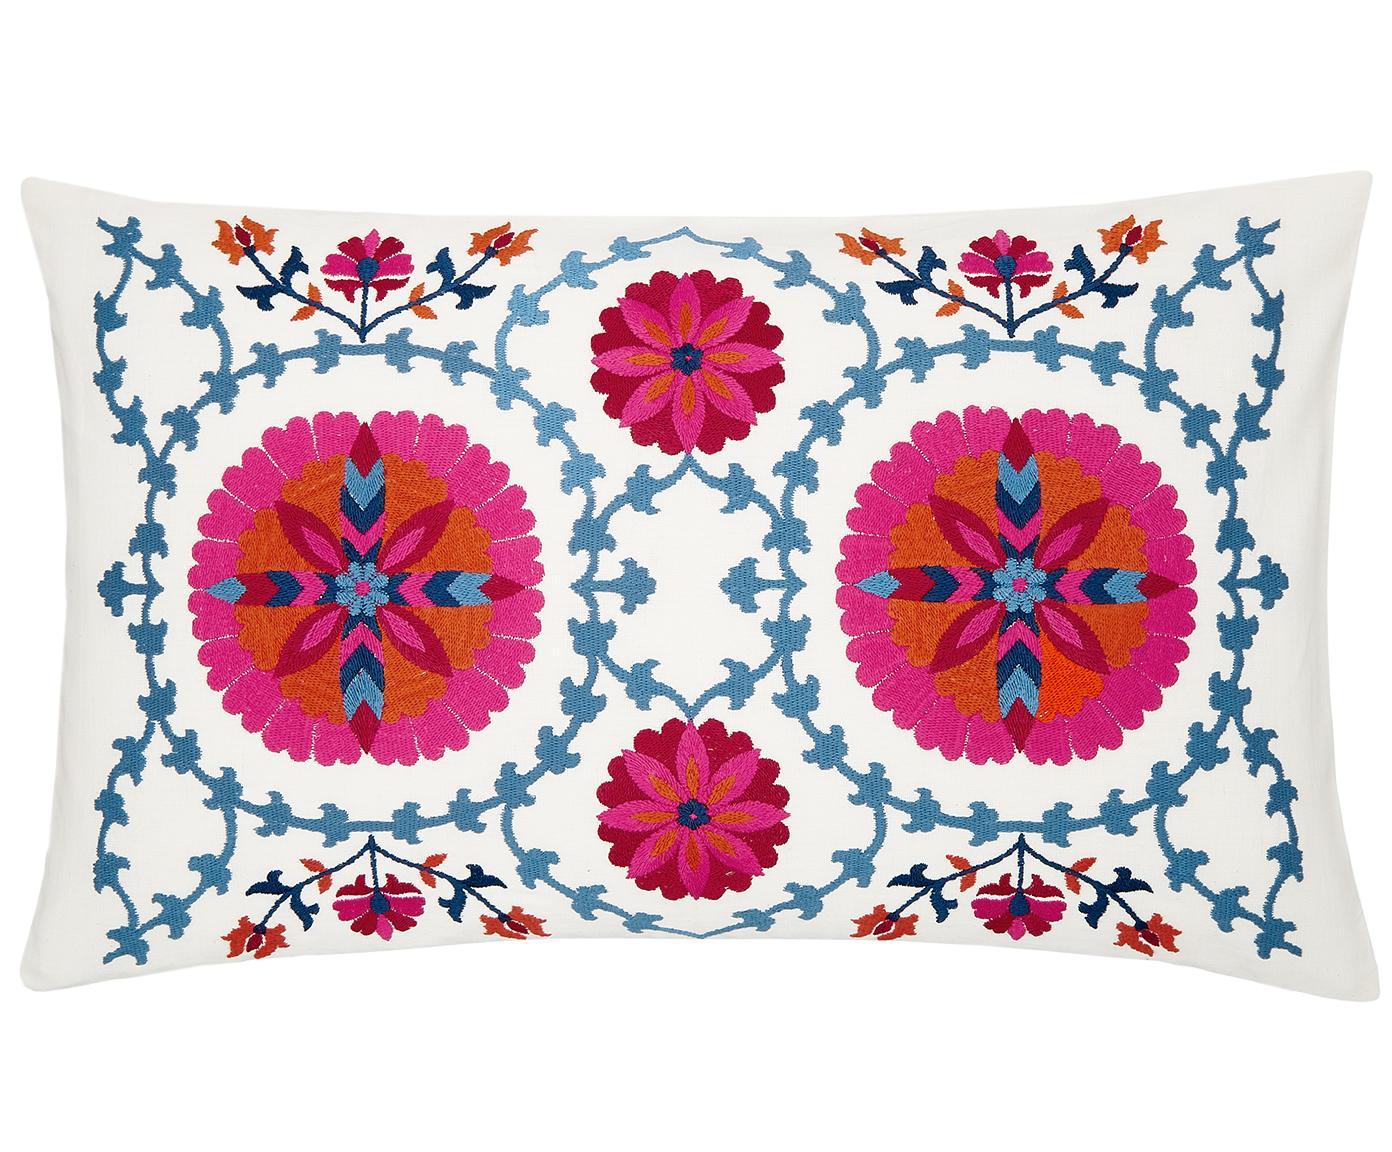 Bestickte Kissenhülle Tabula, 100% Baumwolle, Cremeweiss, Mehrfarbig, 30 x 50 cm